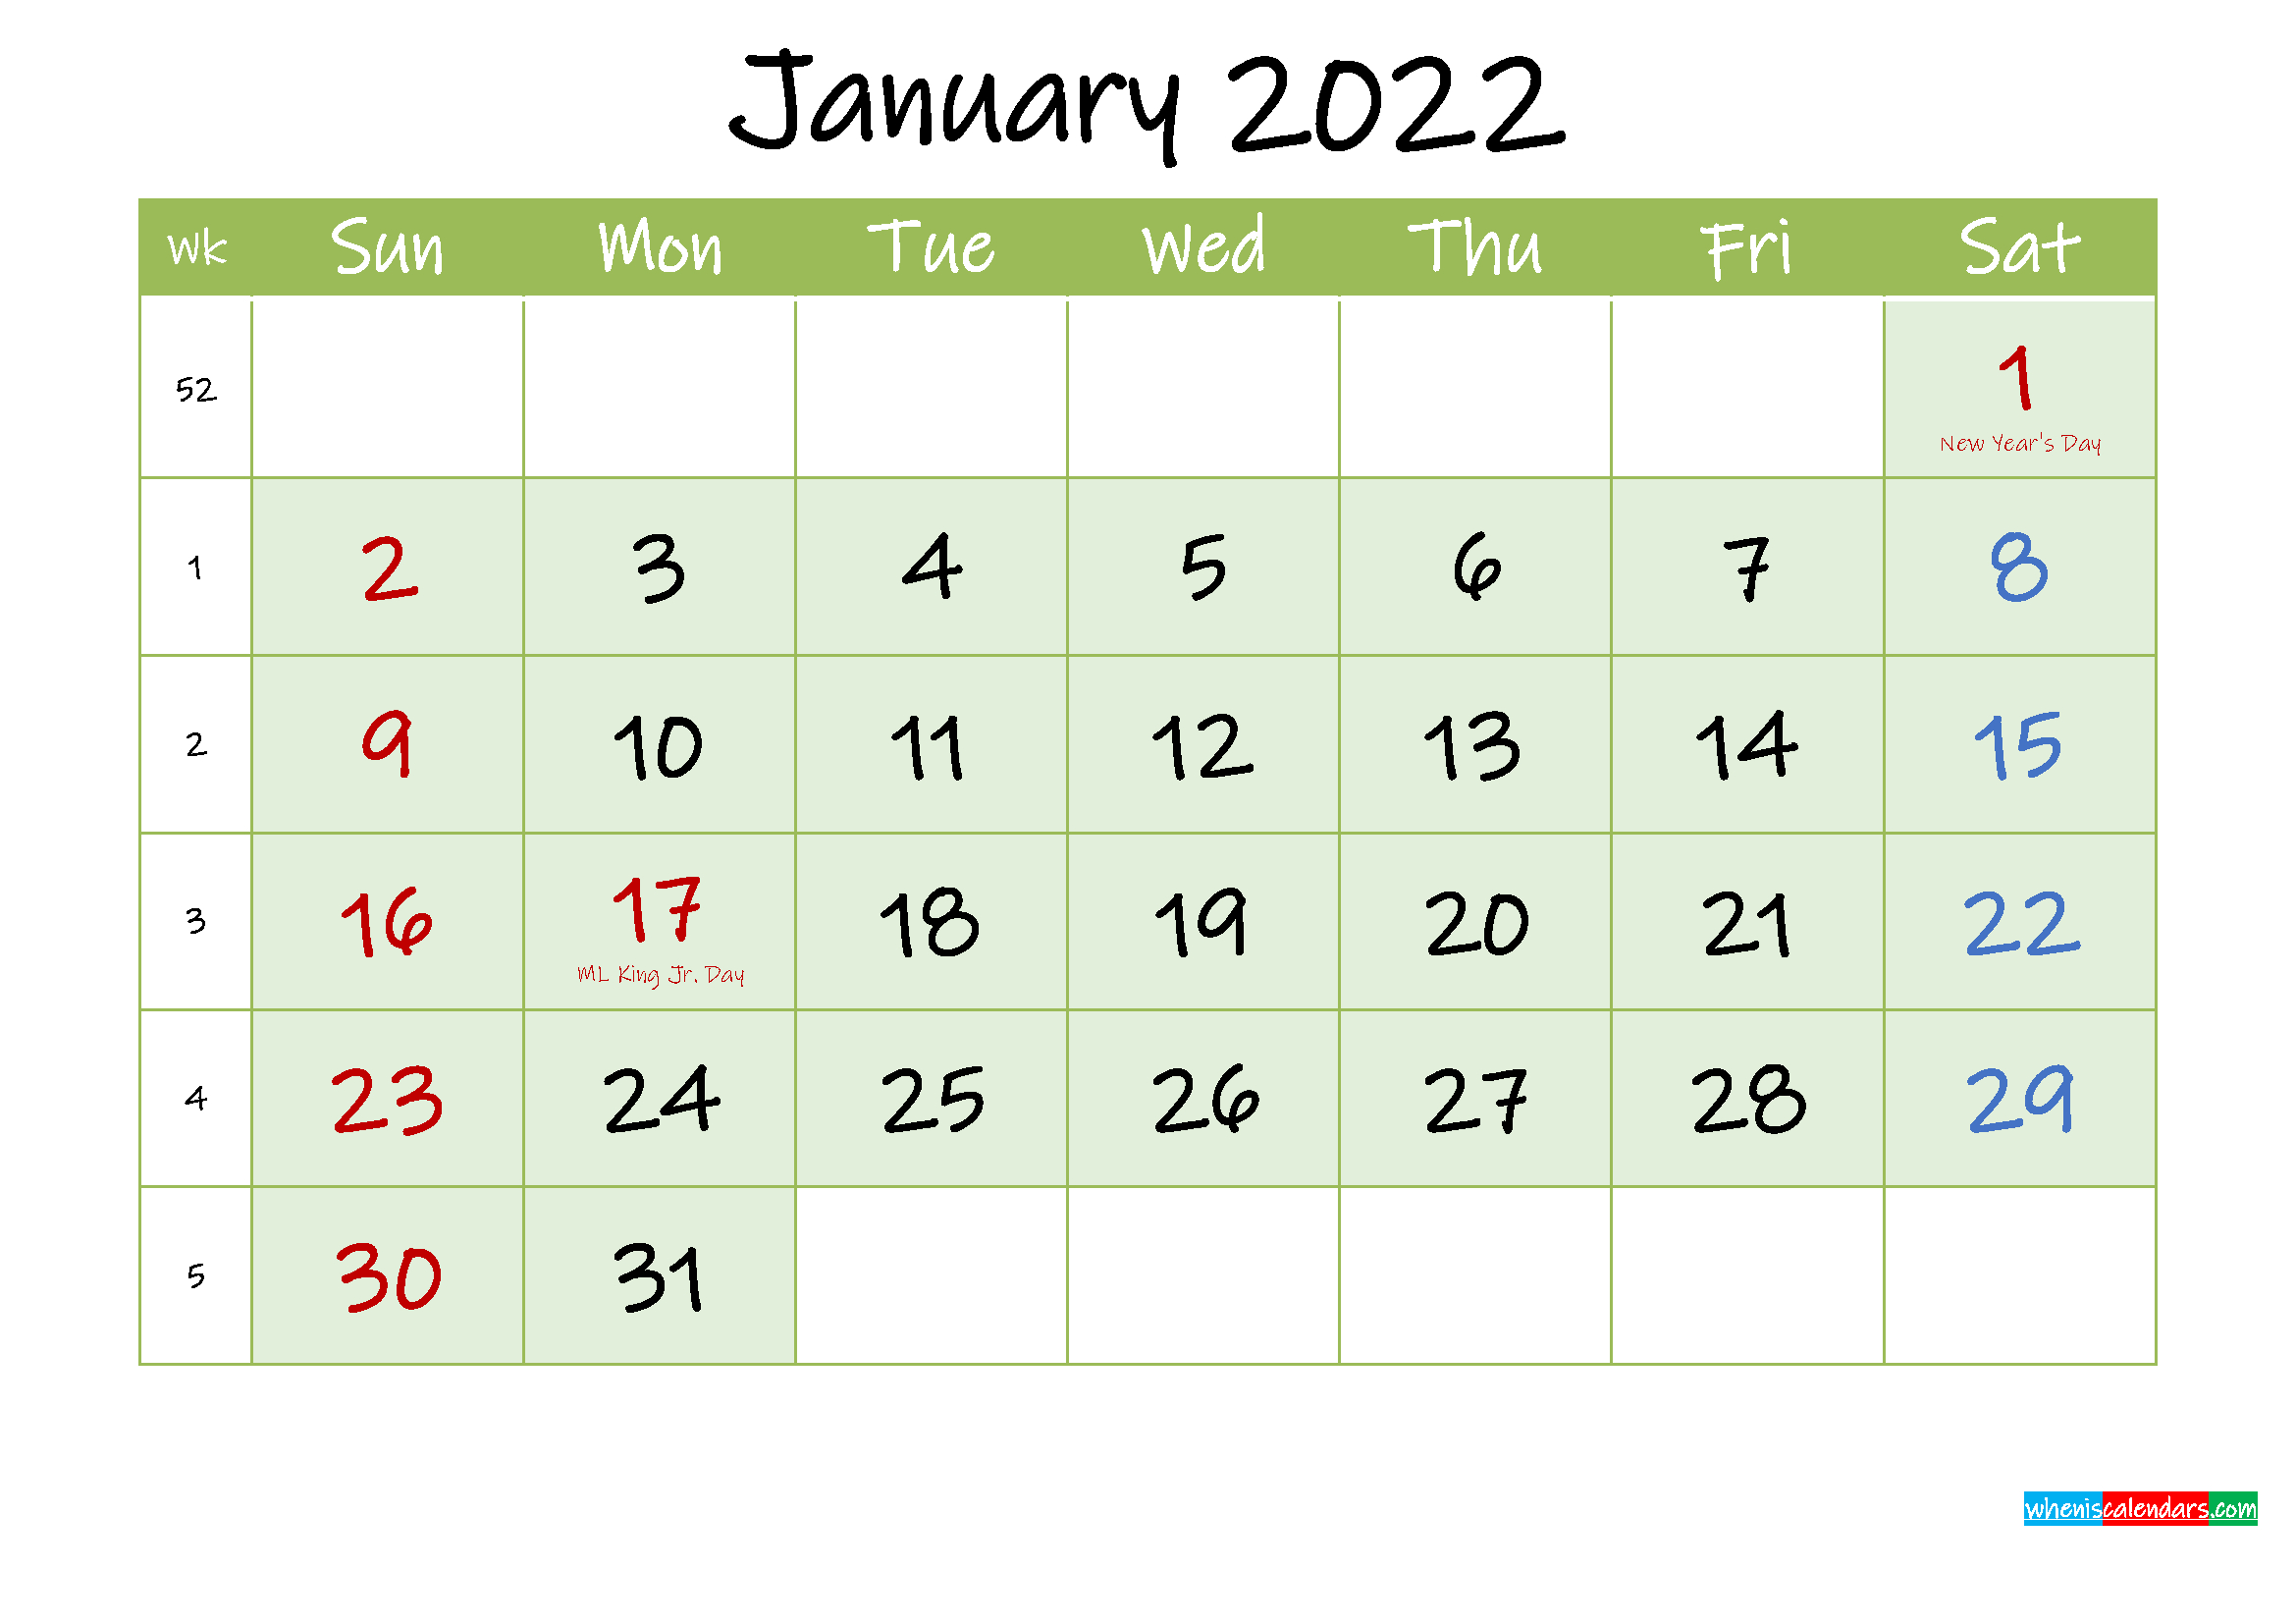 January 2022 Free Printable Calendar - Template Ink22M121 throughout January 2022 Calendar Printable Free Graphics